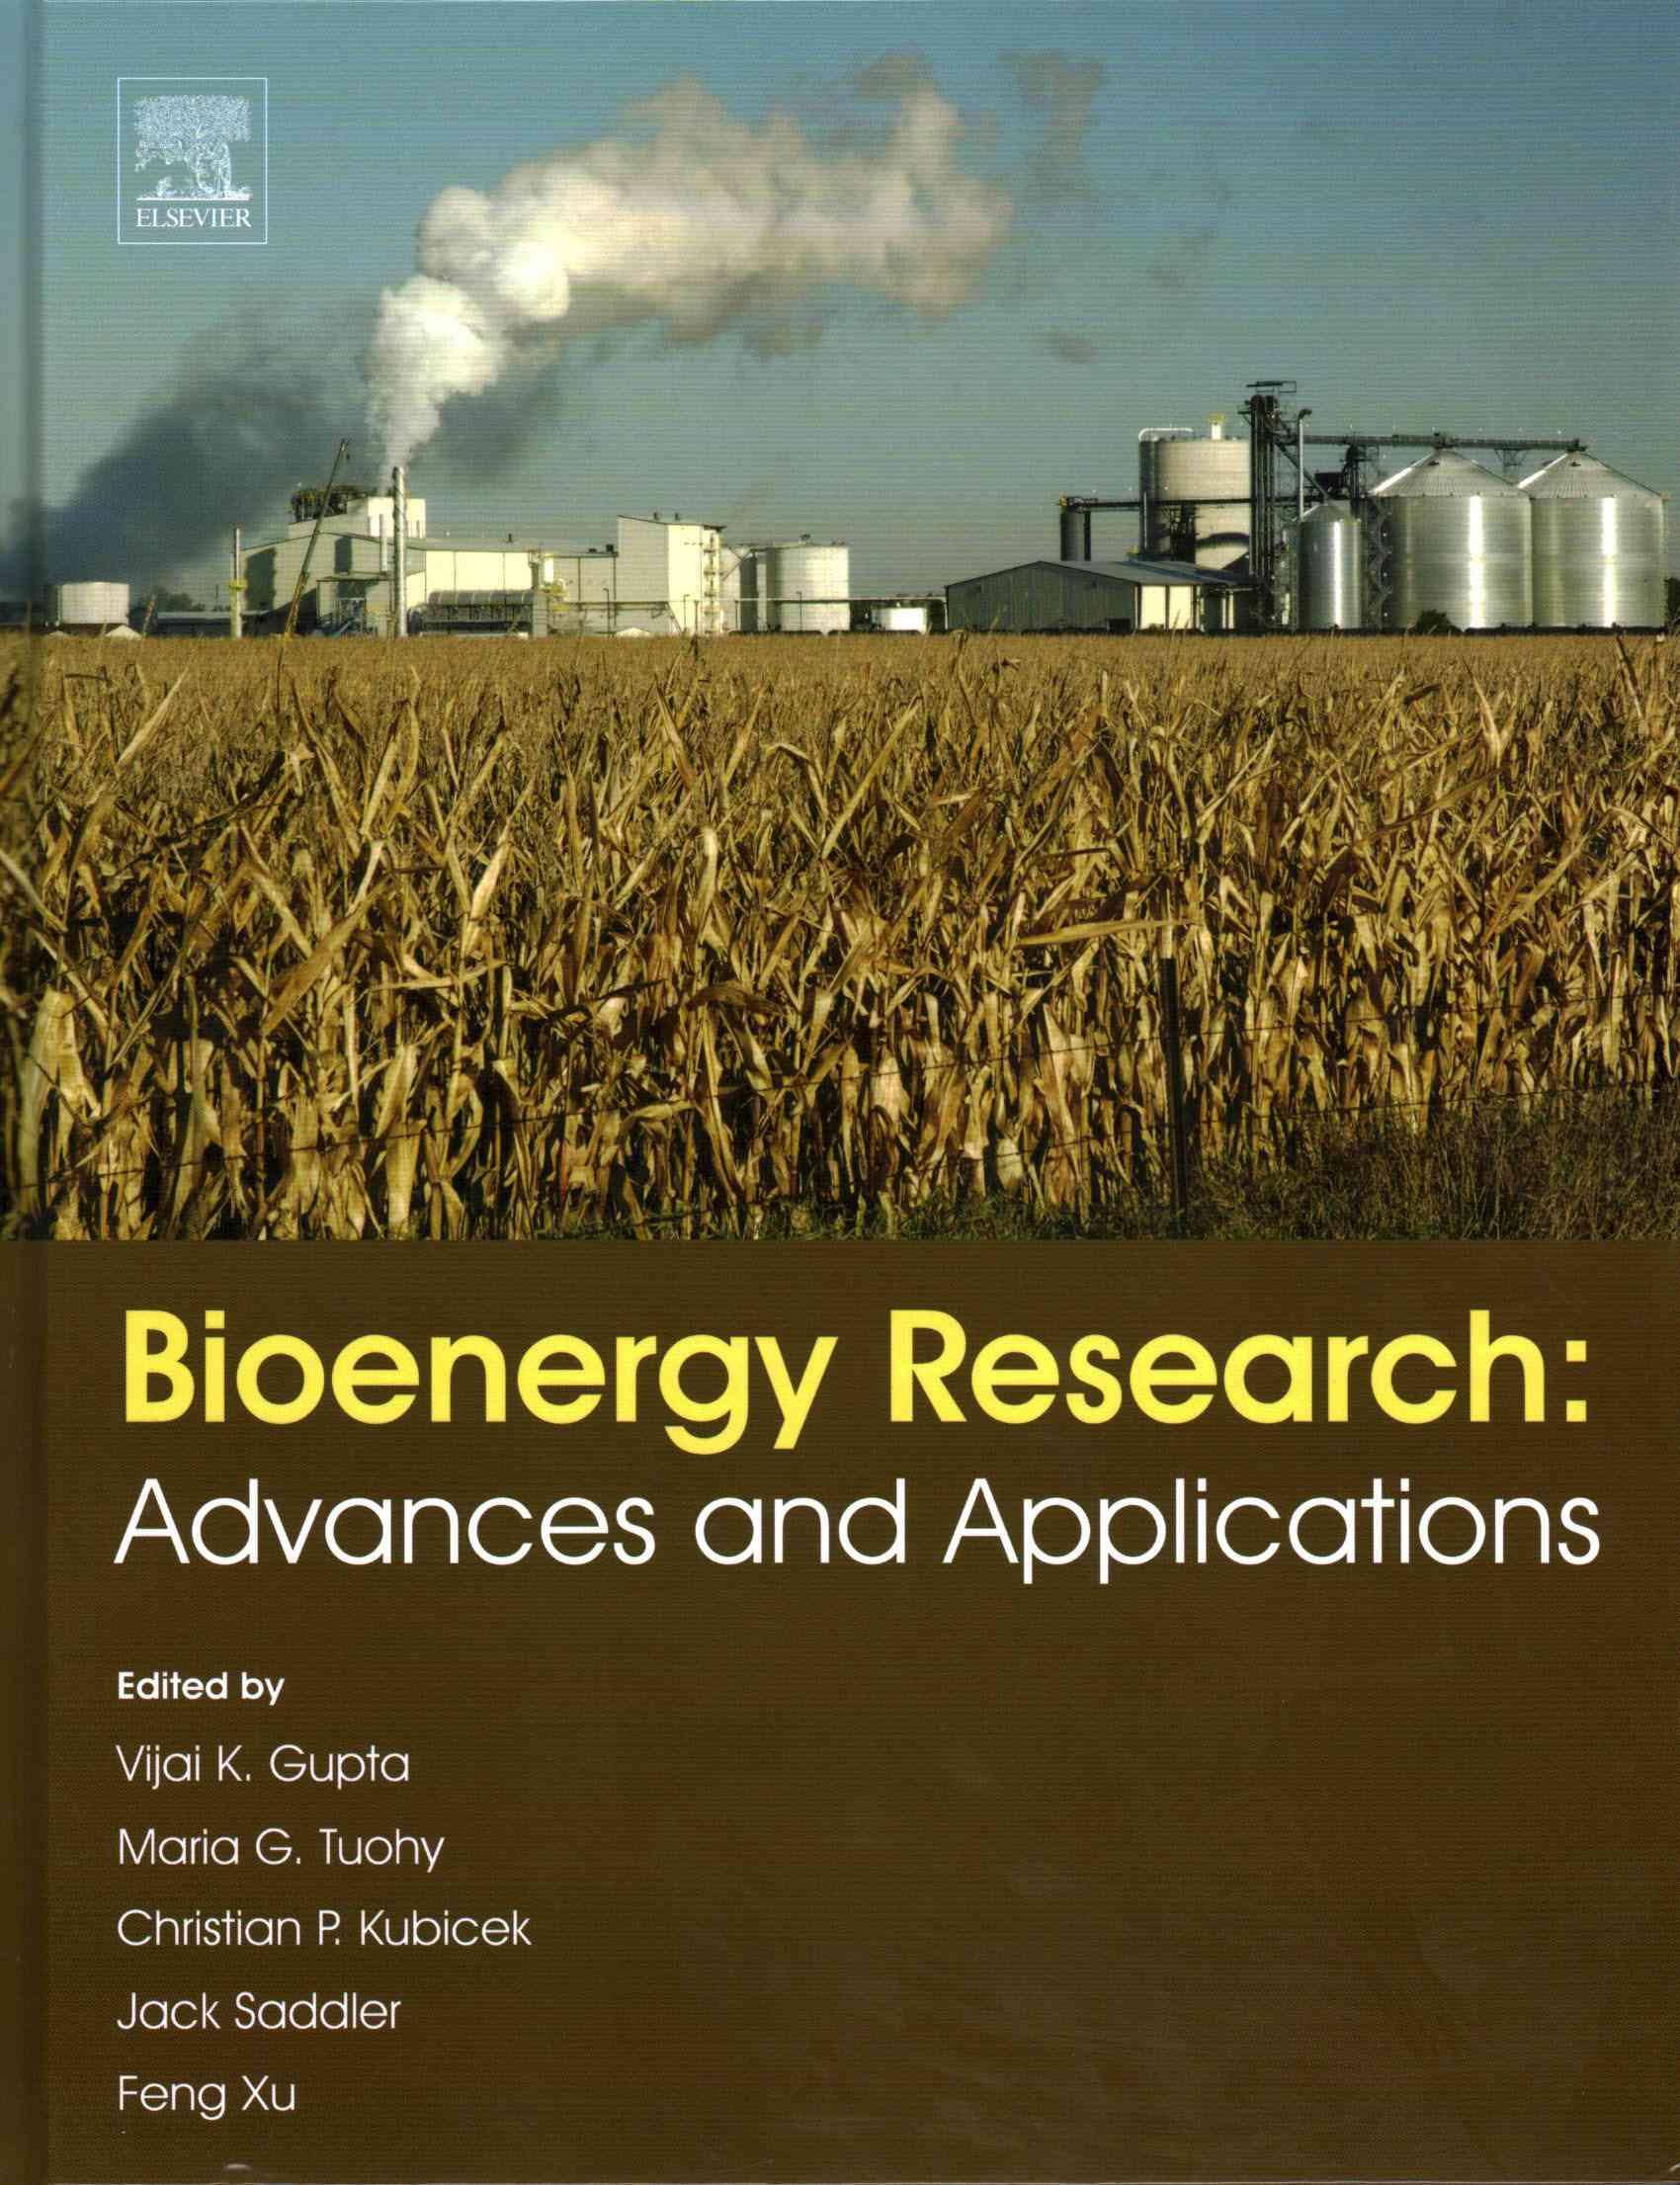 Bioenergy Research By Gupta, Vijai G. (EDT)/ Tuohy, Maria (EDT)/ Kubicek, Christian P. (EDT)/ Saddler, Jack (EDT)/ Xu, Feng (EDT)